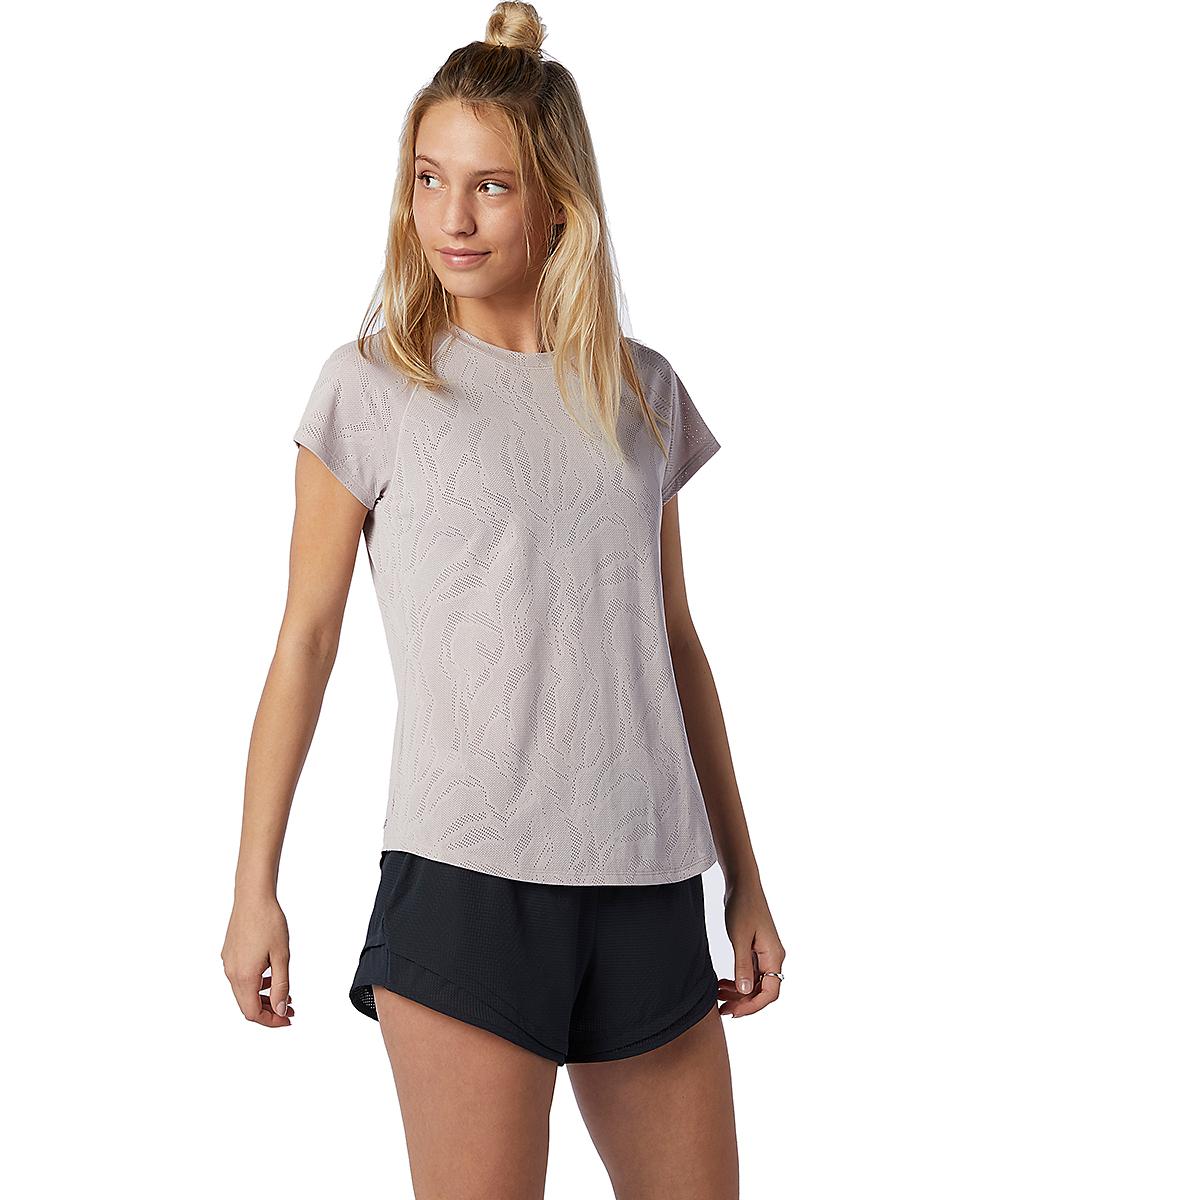 Women's New Balance Q Speed Fuel Jacquard Short Sleeve - Color: Logwood - Size: XS, Logwood, large, image 1